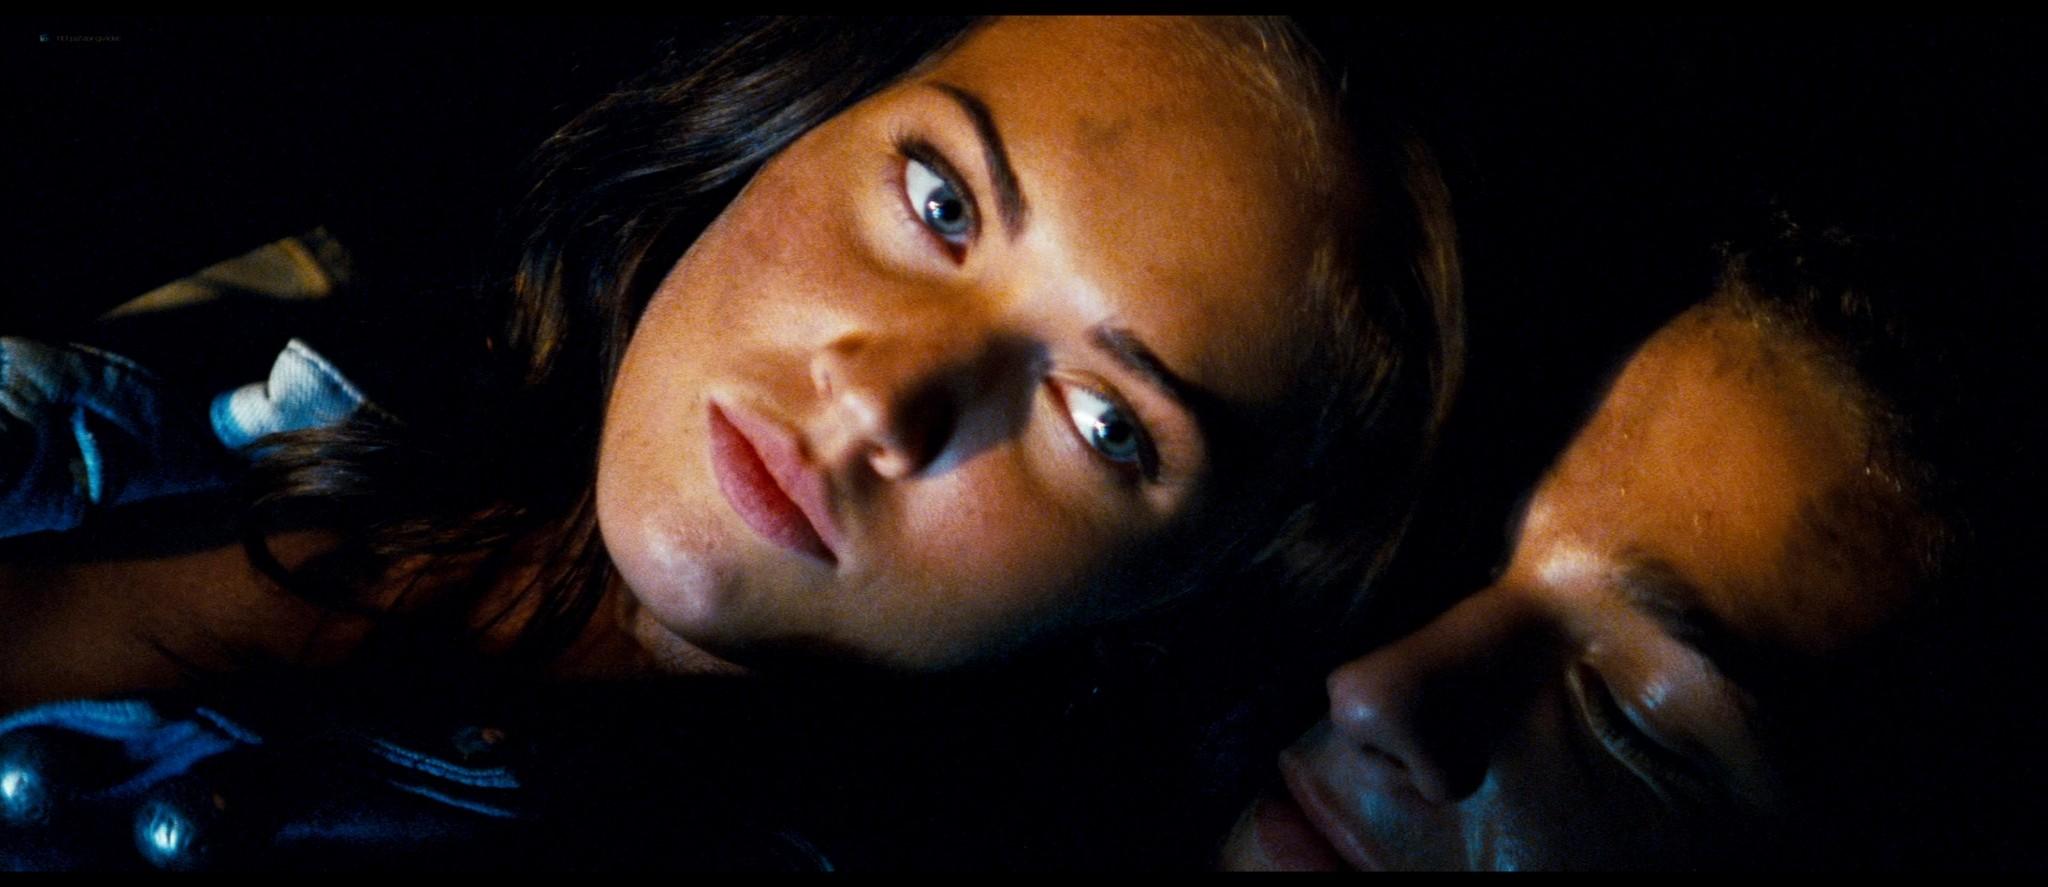 Megan Fox hot and sexy - Transformers (2007) HD 1080p BluRay Remux (7)